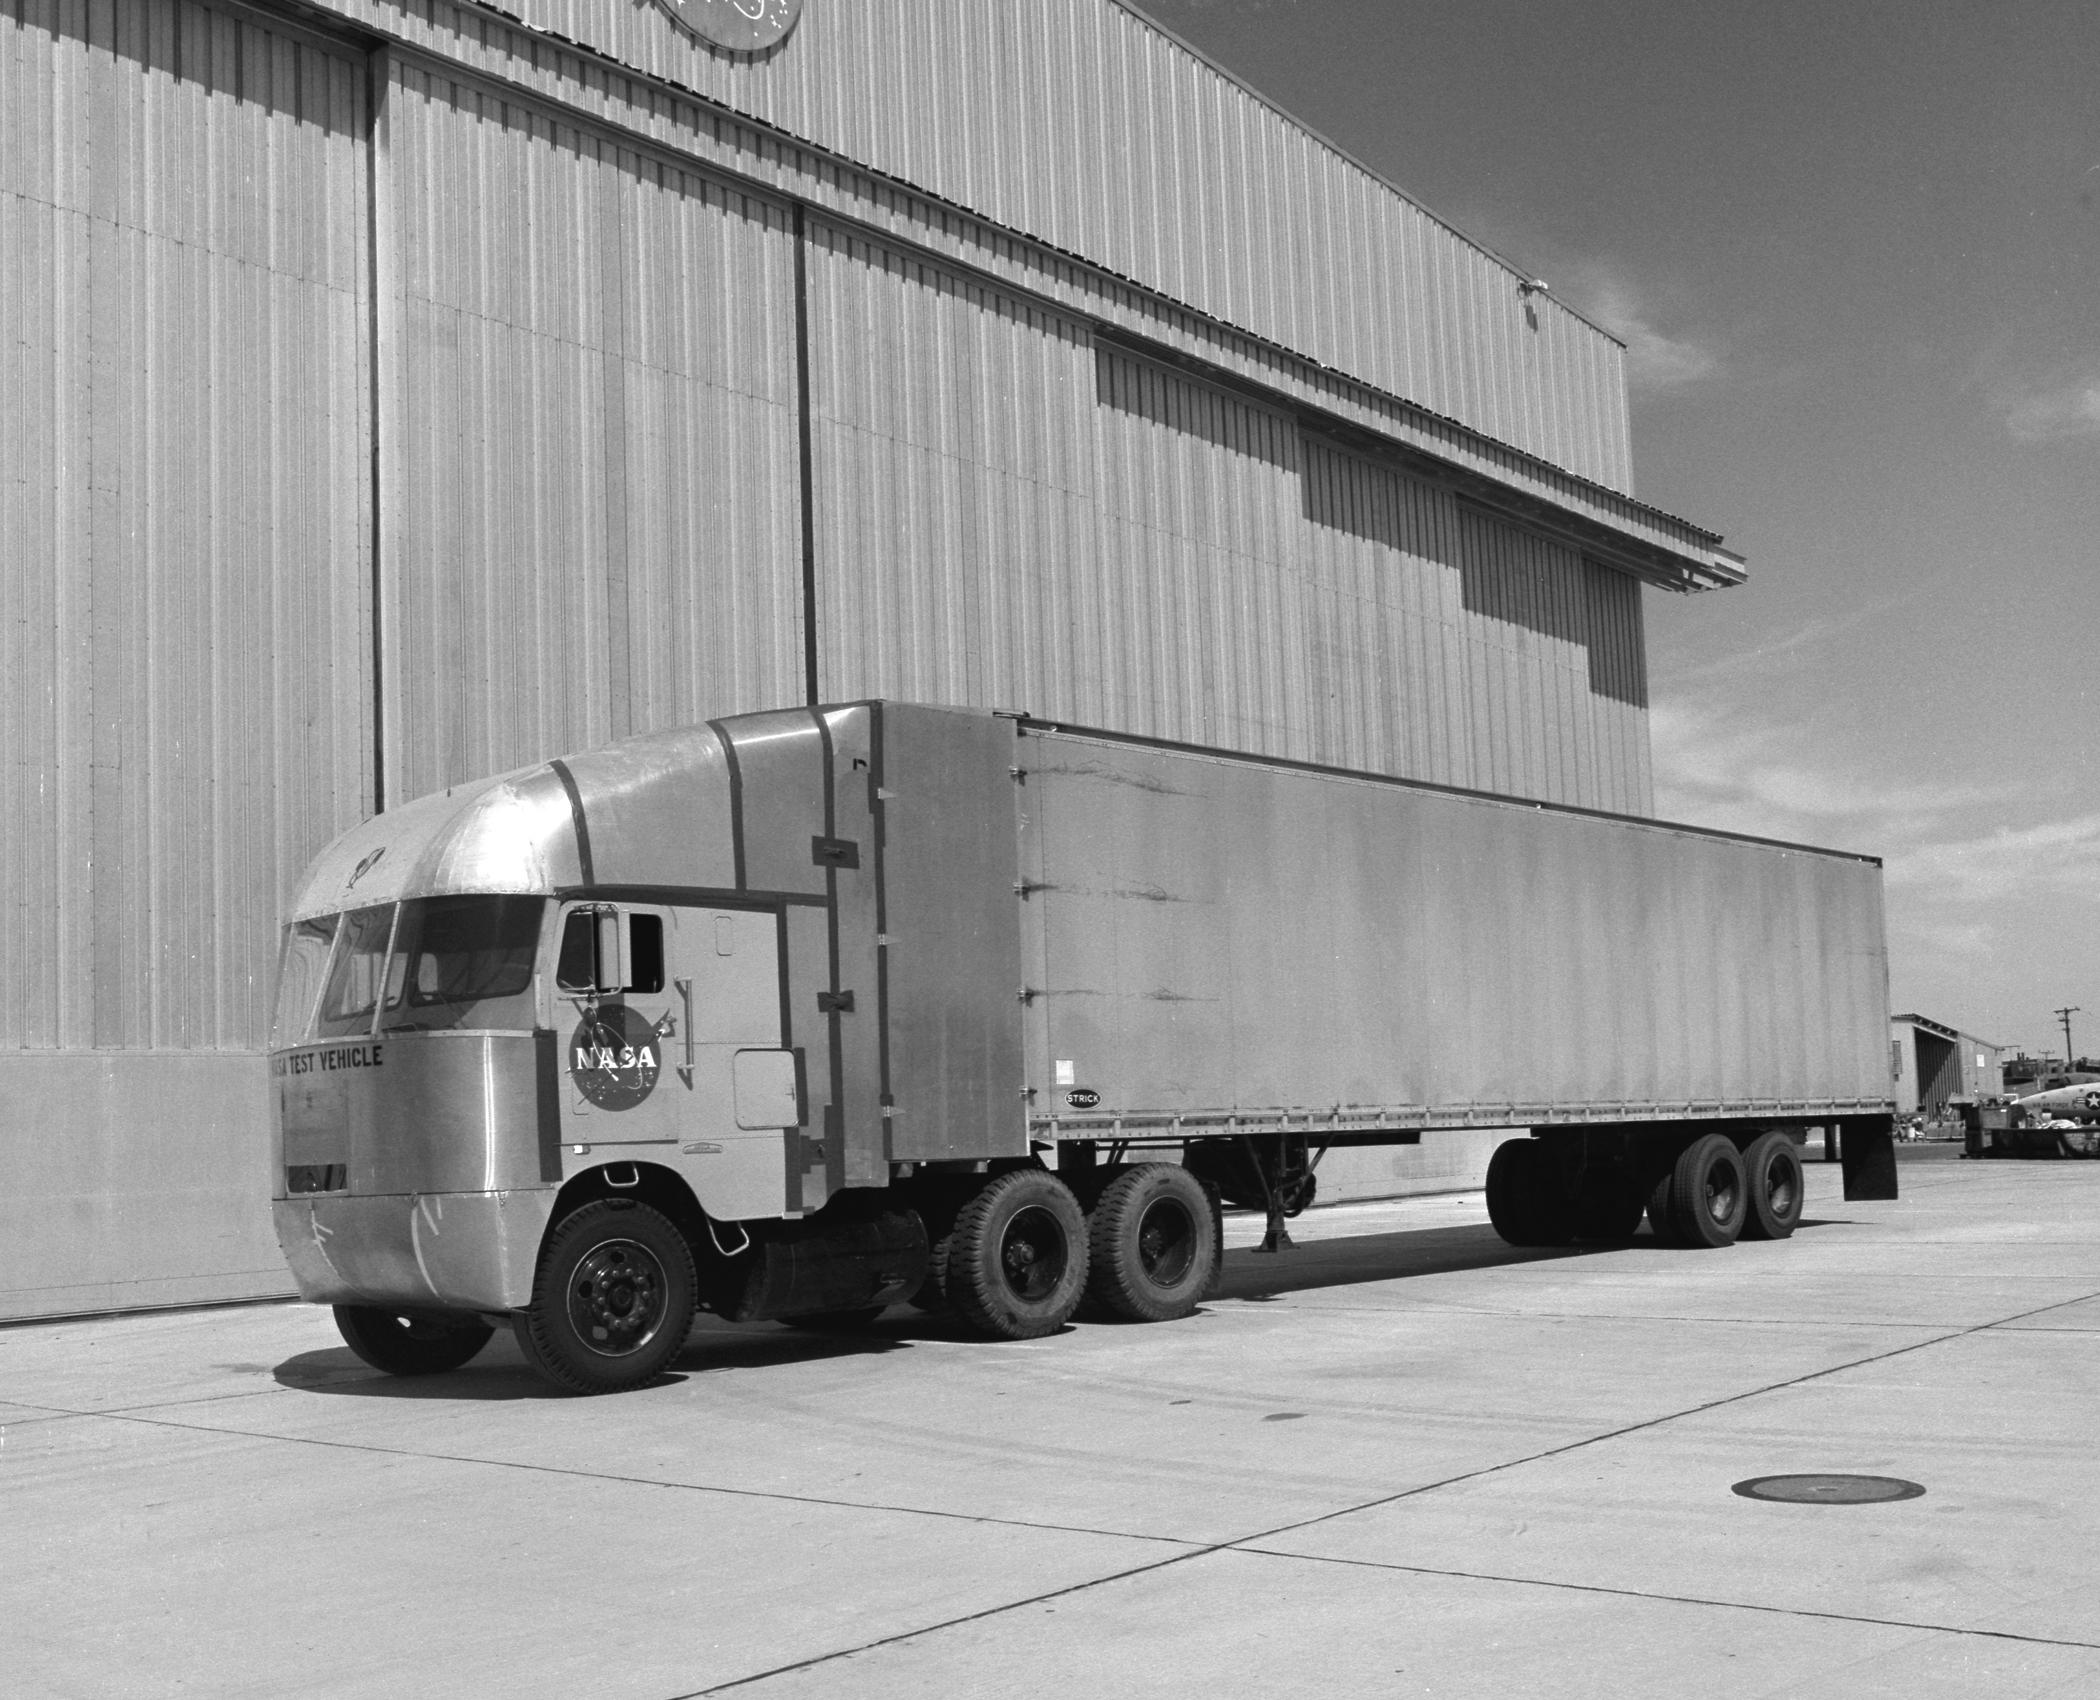 Aerodynamic Tractor Trailer : Aerodynamic truck studies cab over engine tractor trailer